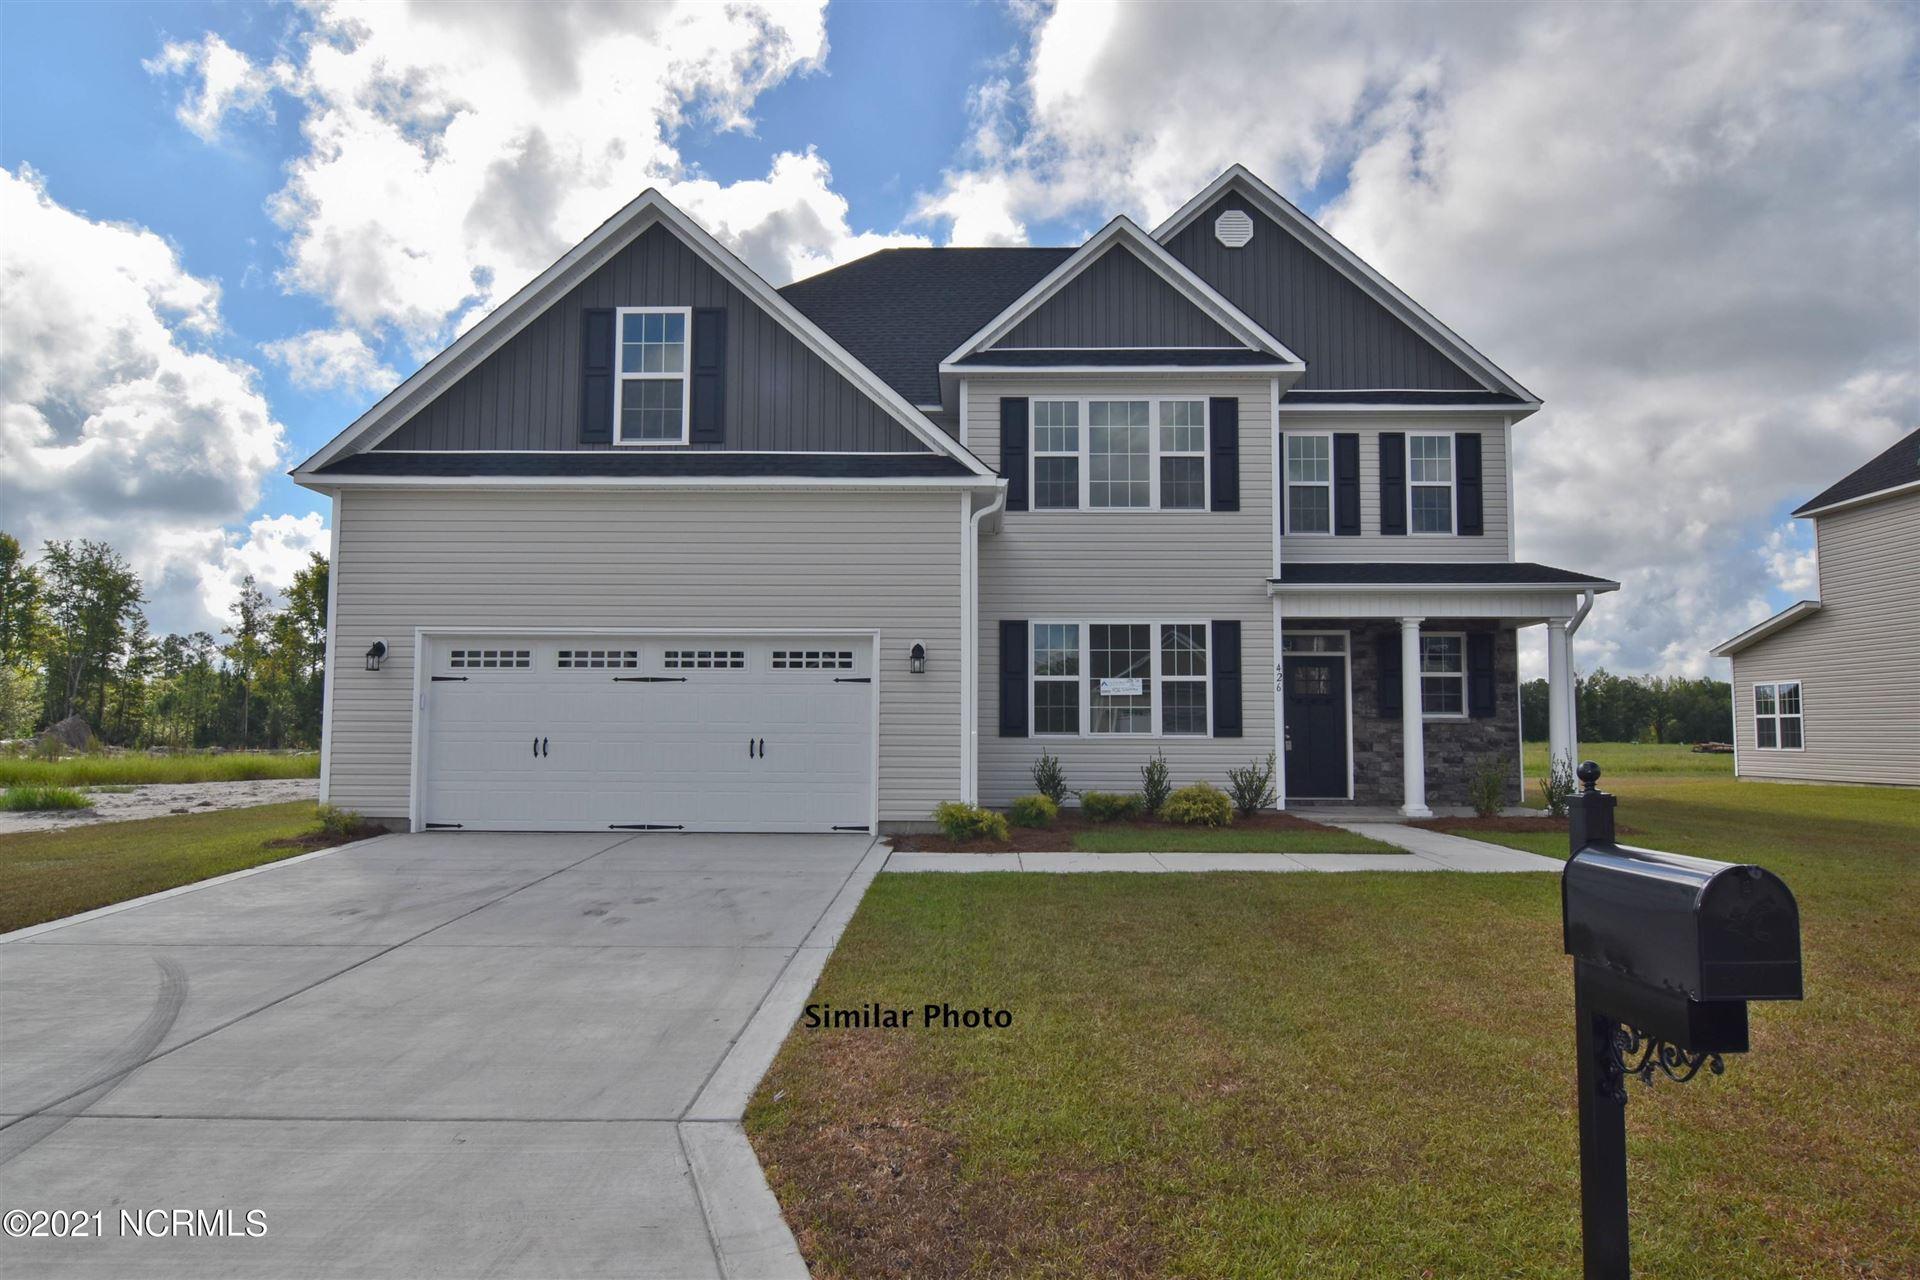 Photo for 504 Jarrott's Place, Jacksonville, NC 28546 (MLS # 100272695)